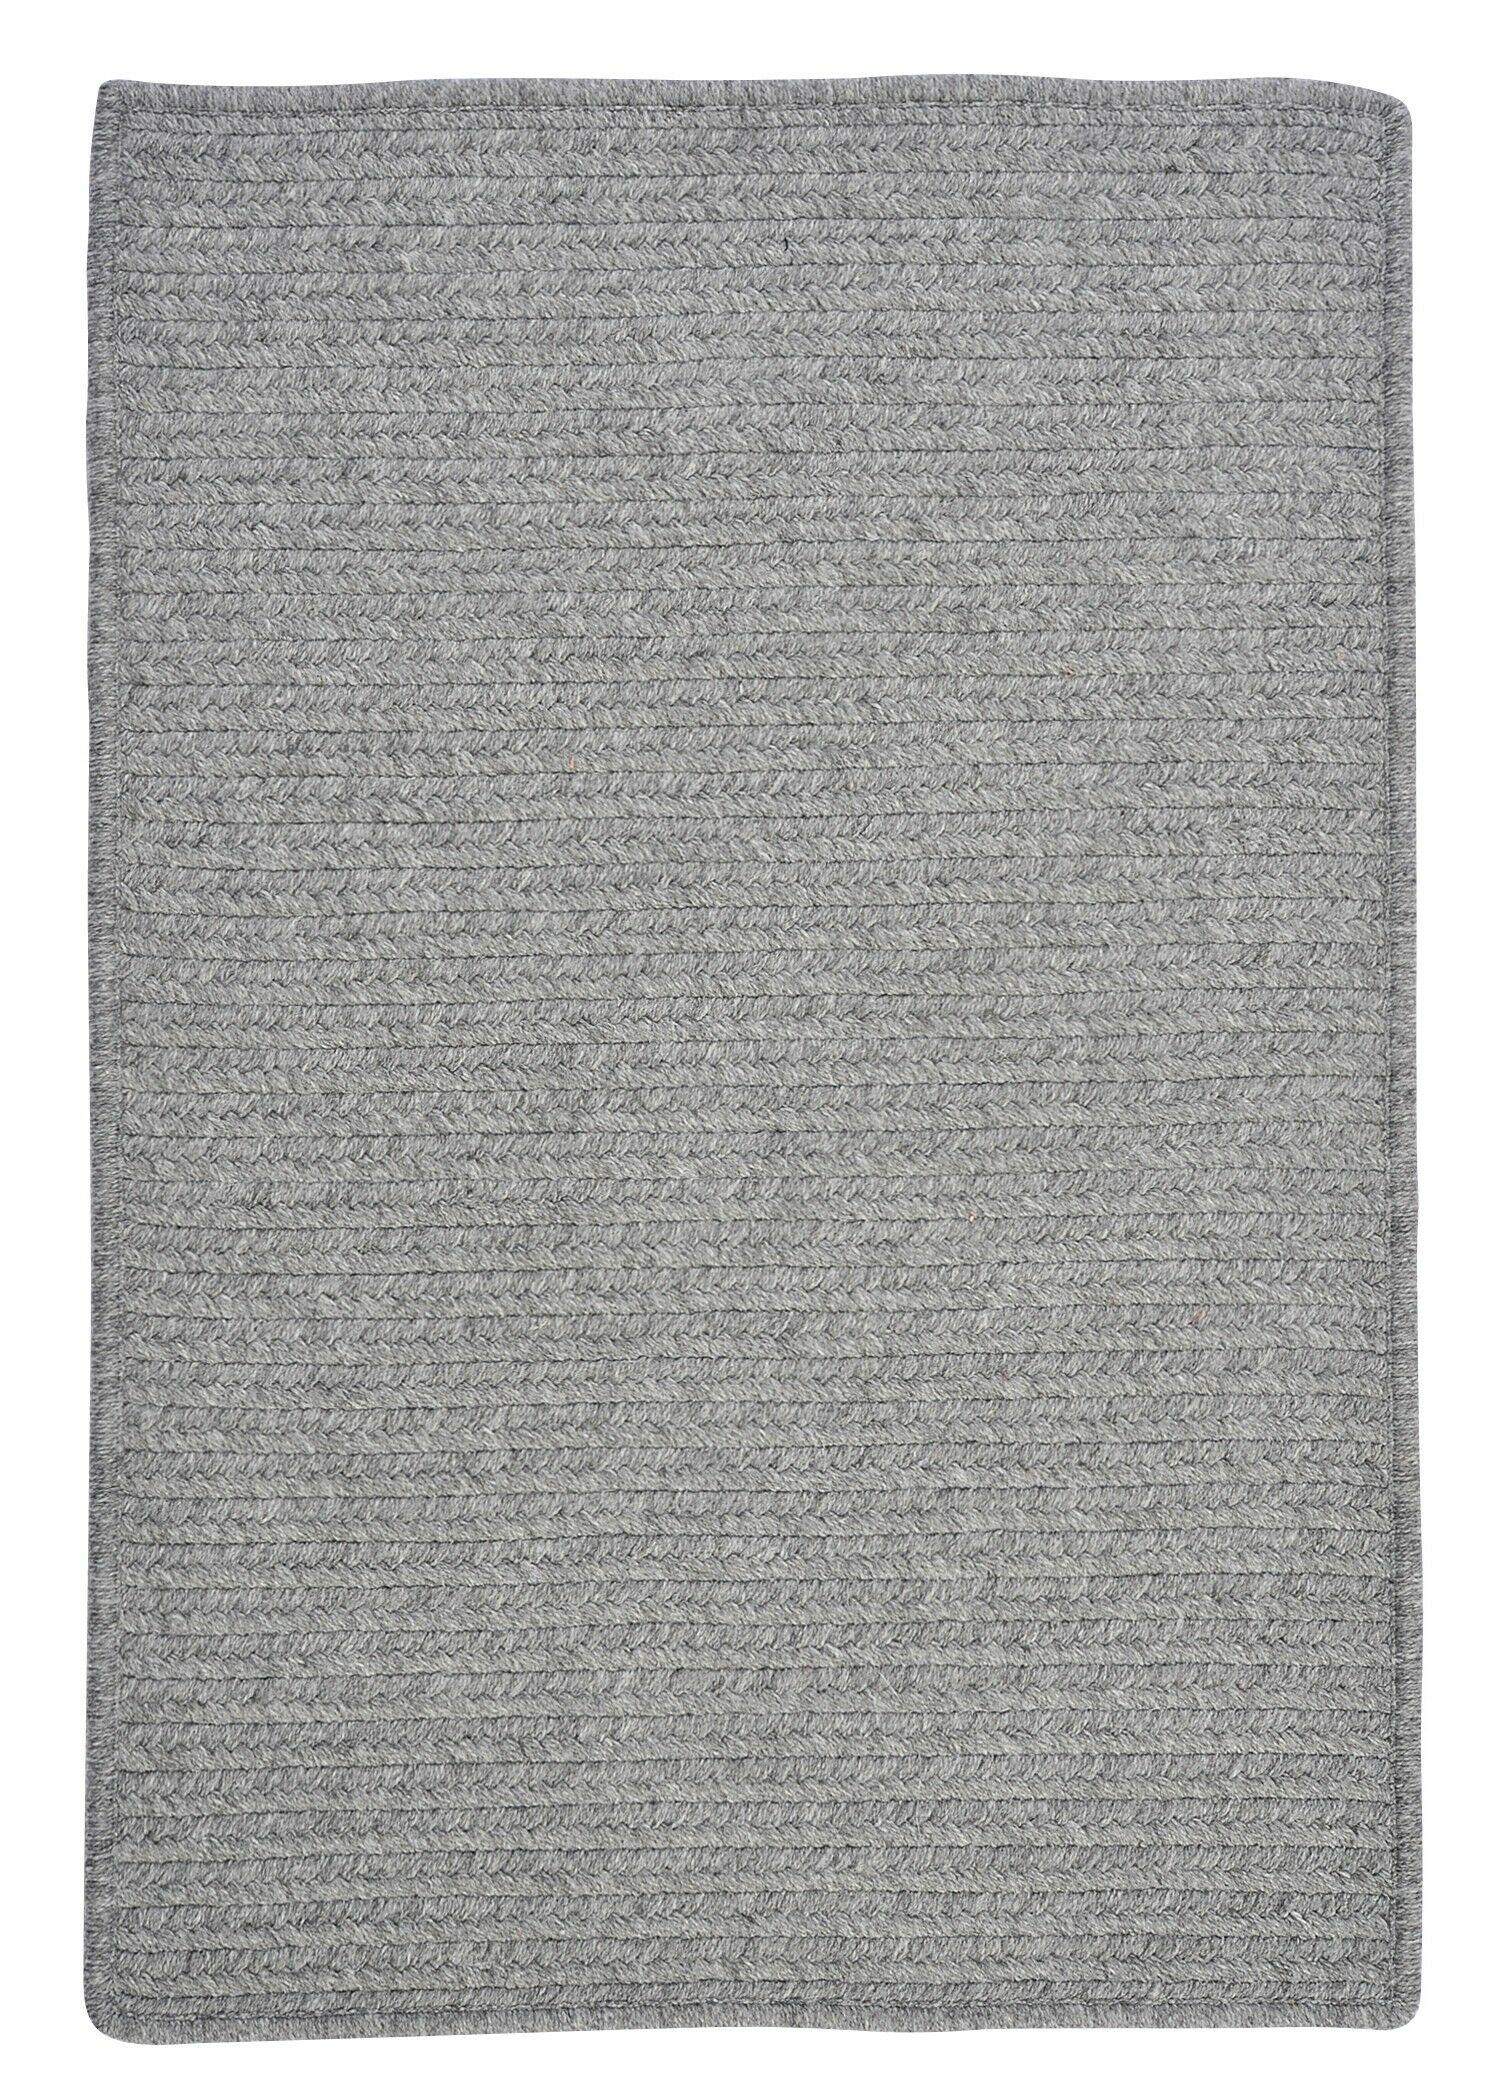 Westminster Light Gray Area Rug Rug Size: Rectangle 12' x 15'